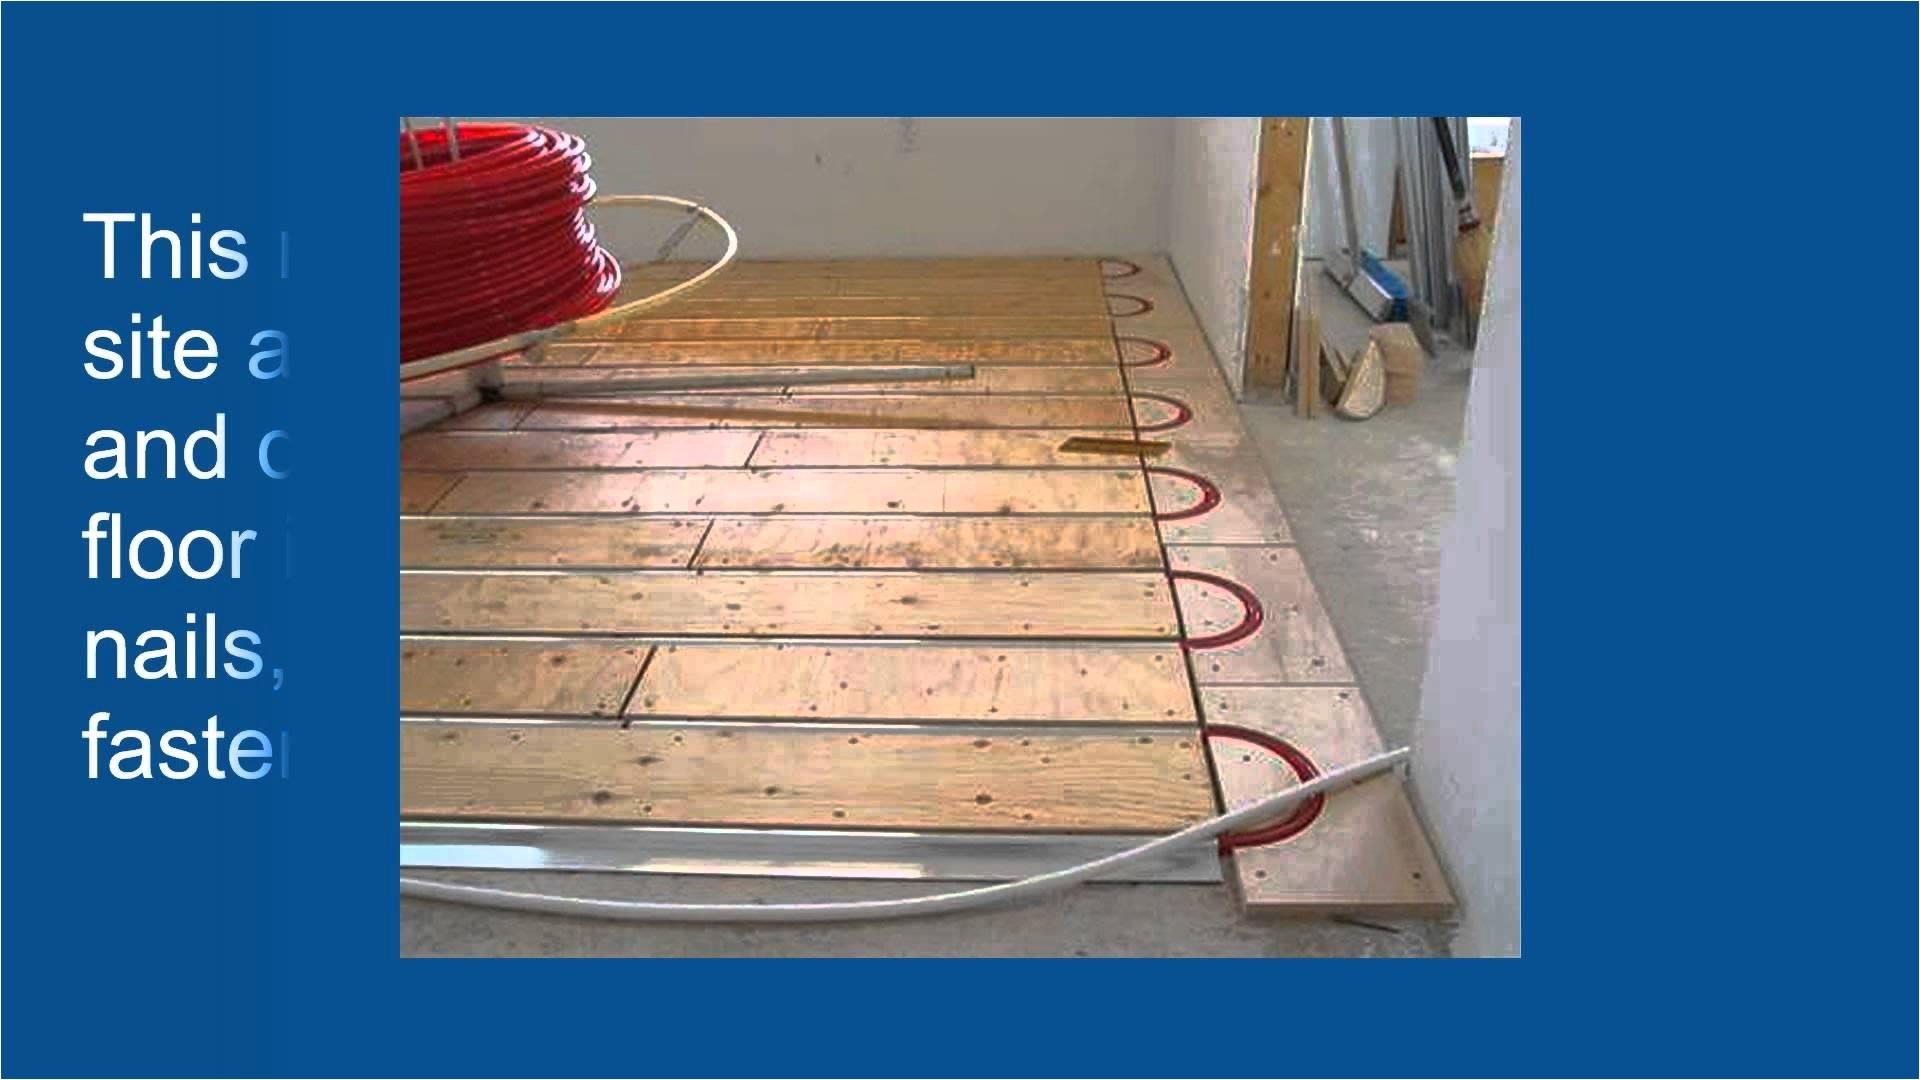 Diy Heated Floor Kit Advantages Of thermofin U for Radiant Heated Floors Youtube